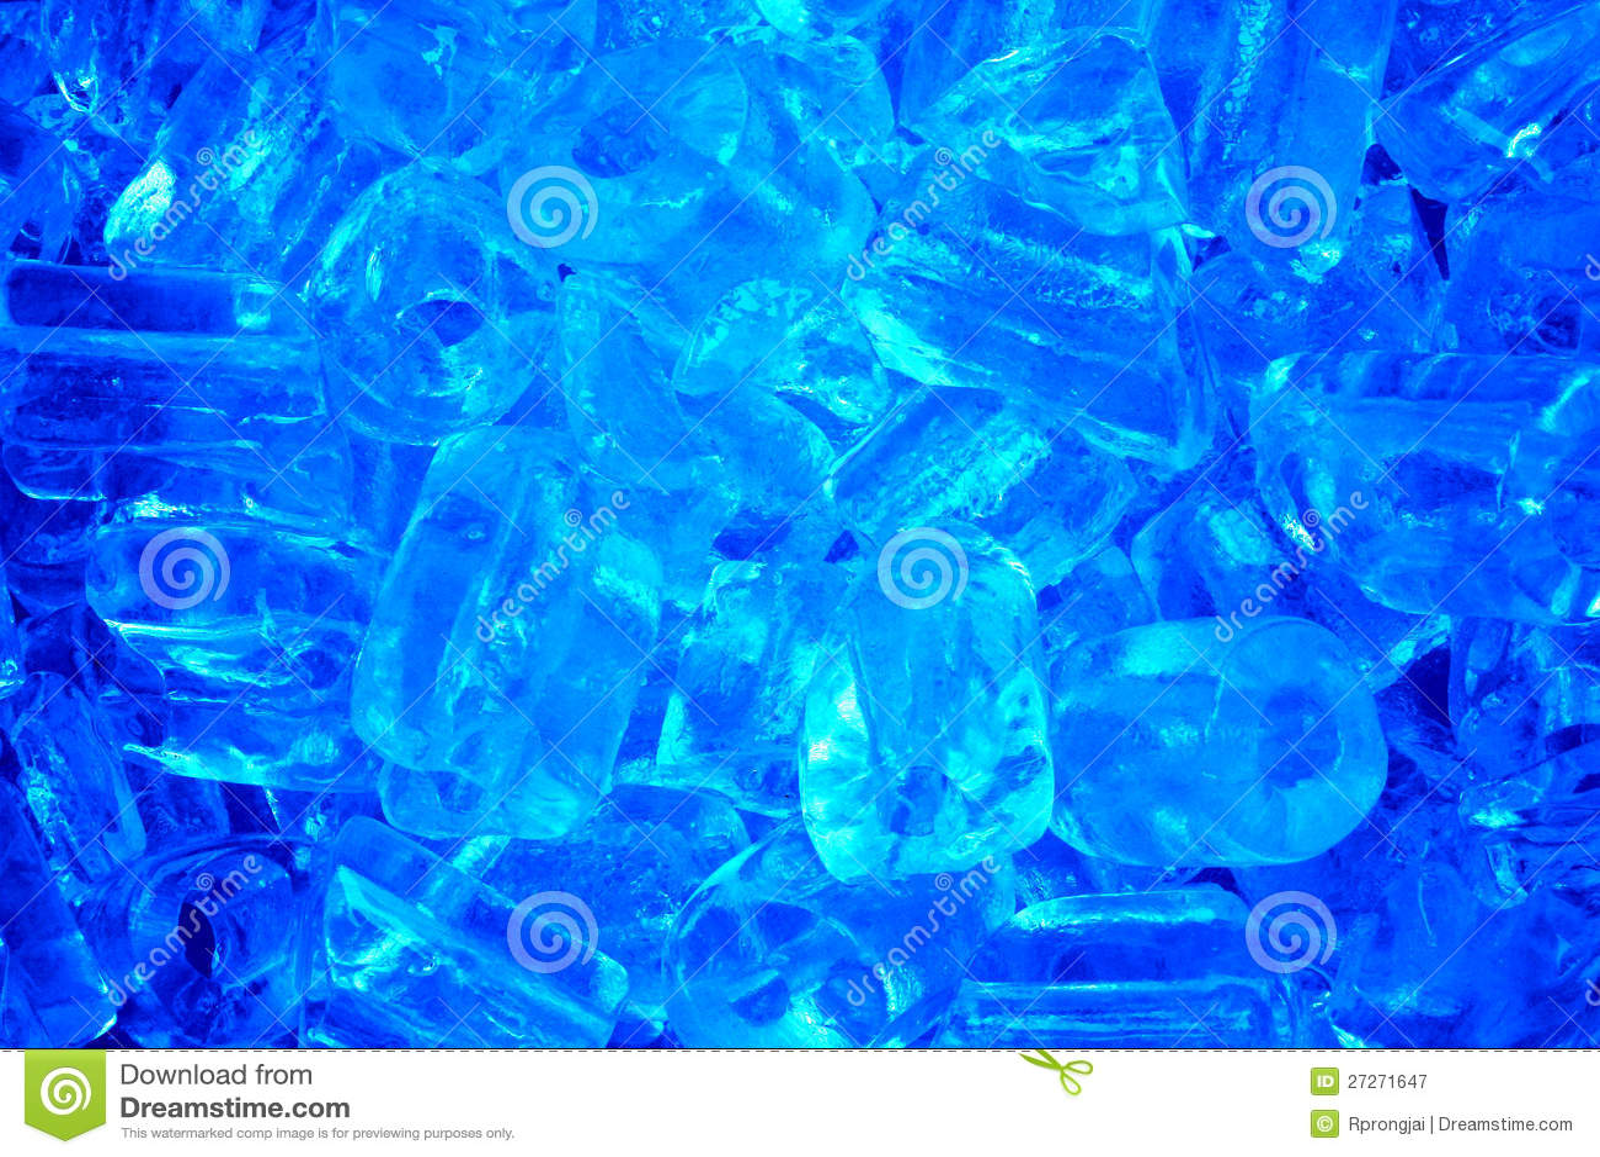 Fresh Cool Ice Cube Stock Image. Image Of Happy, Freeze